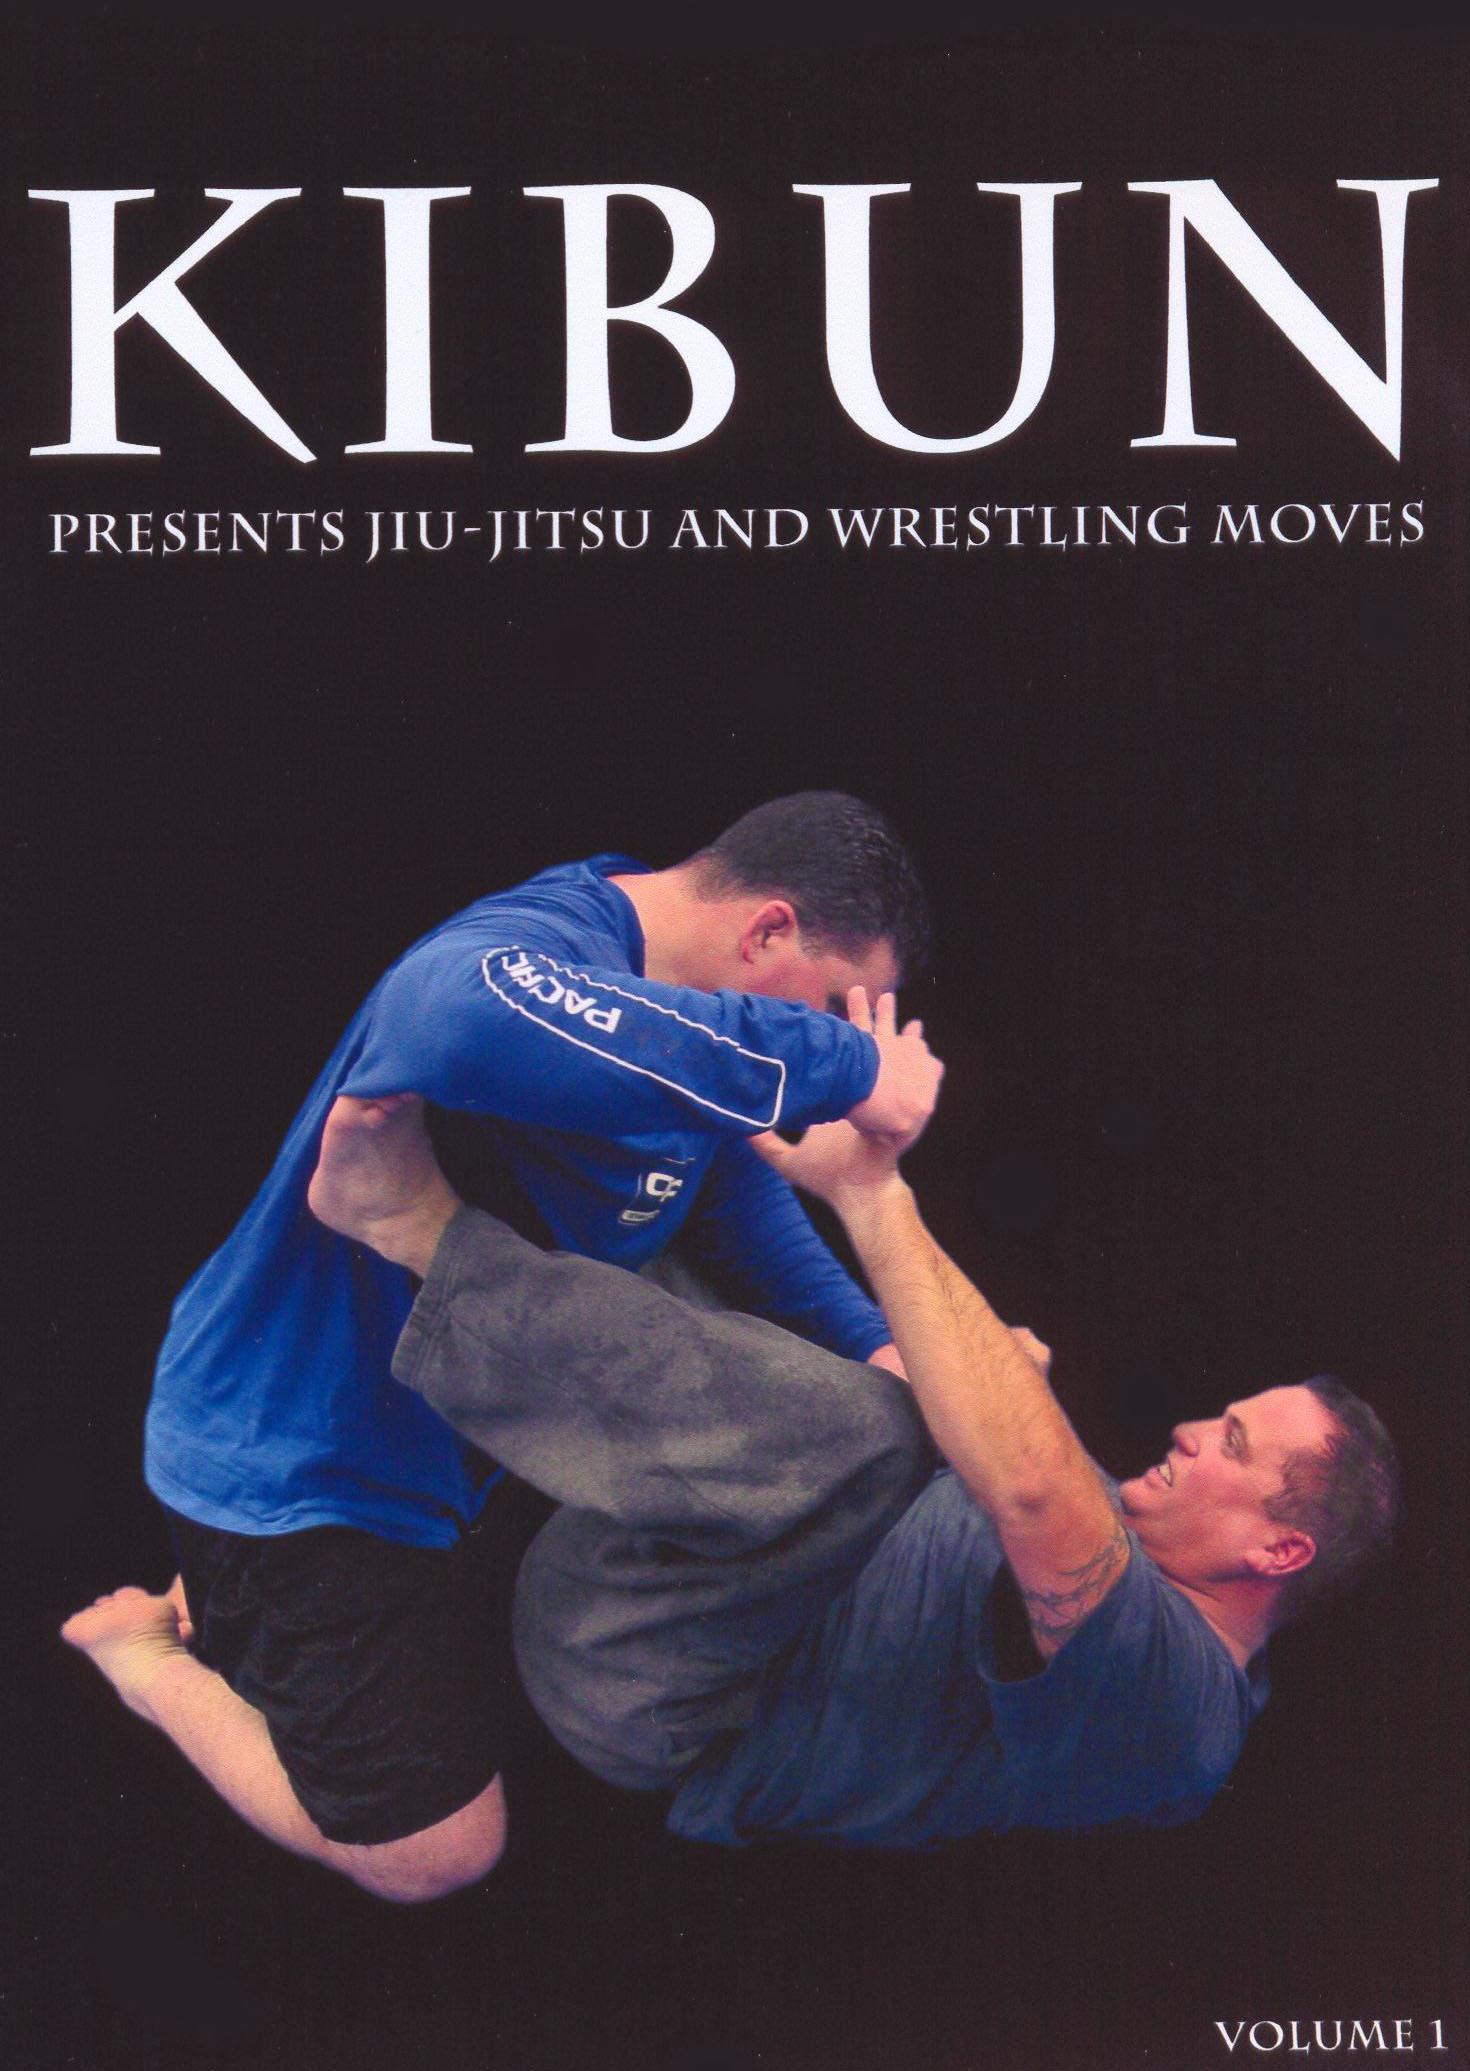 Kibun: Jiu Jitsu and Wrestling Moves, Vol. 1